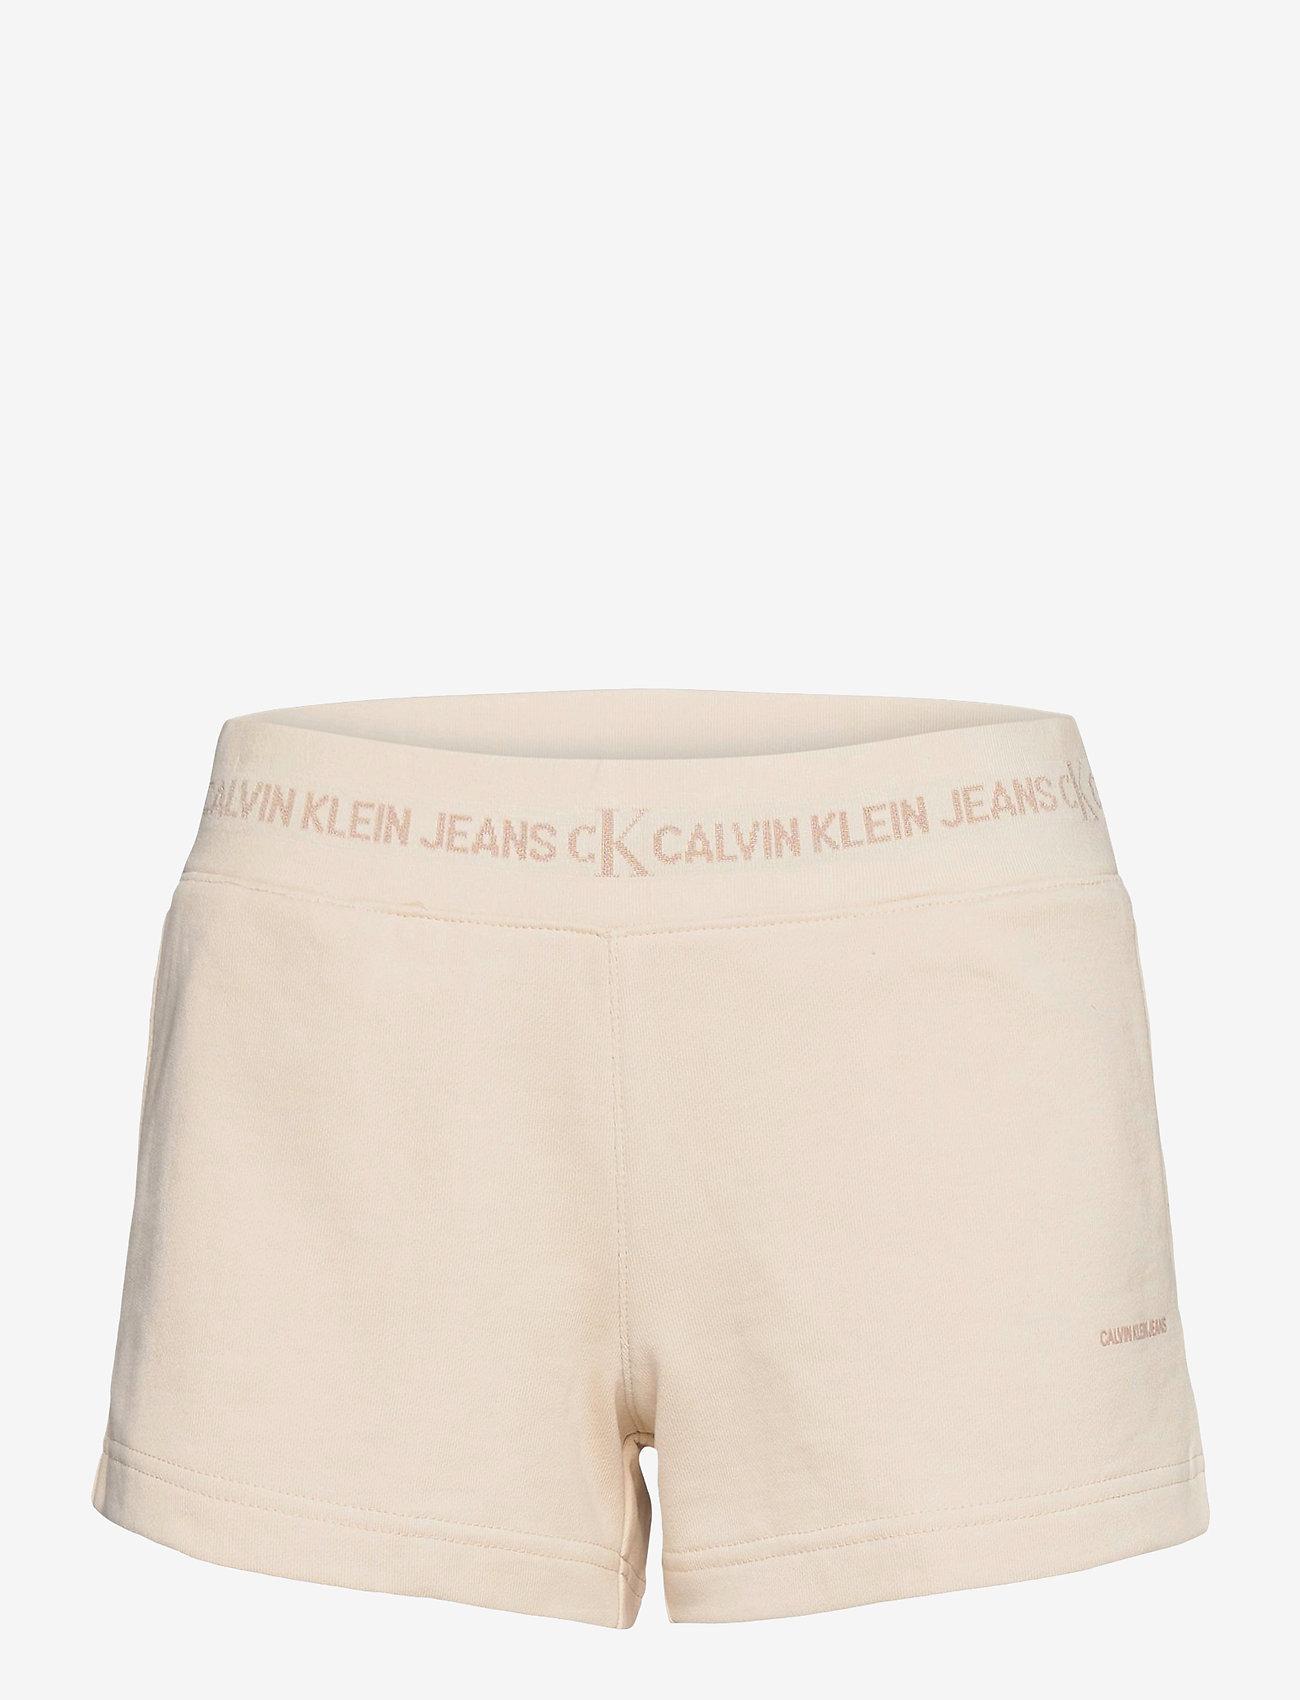 Calvin Klein Jeans - LOGO TRIM KNIT SHORT - casual shorts - white sand - 0